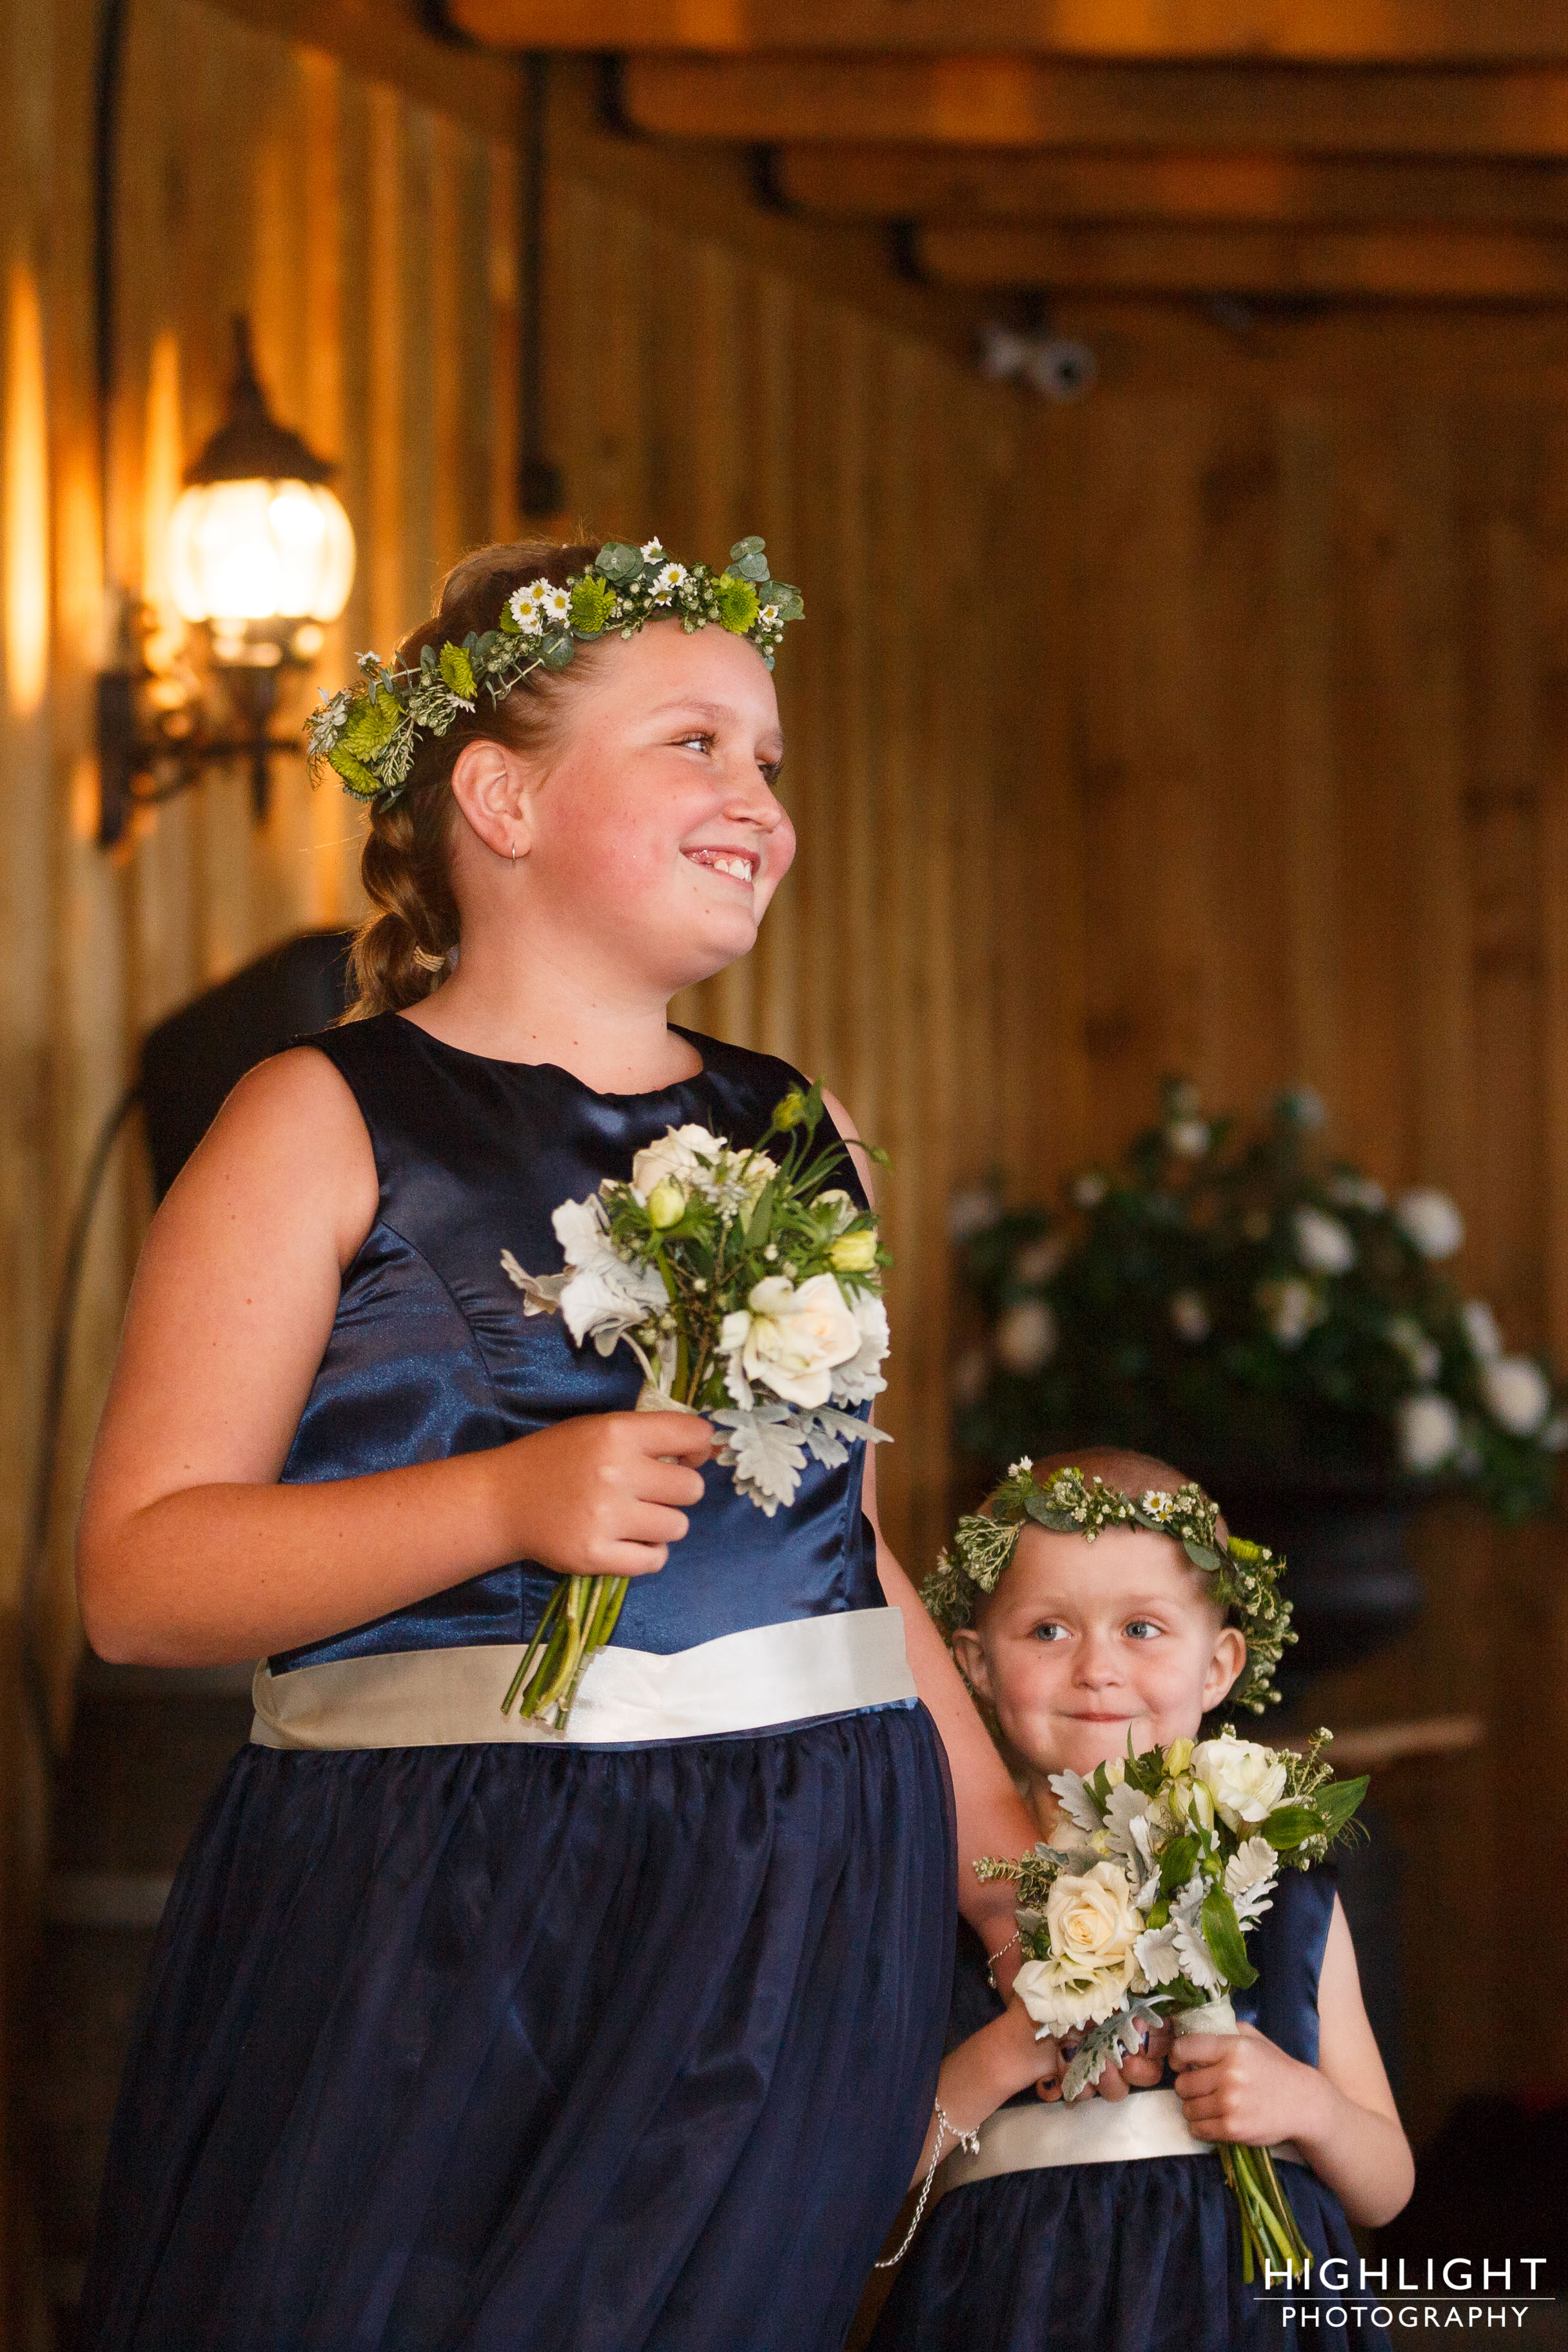 highlight-wedding-photography-palmerston-north-new-zealand-orlando-country-club-wedding-76.jpg